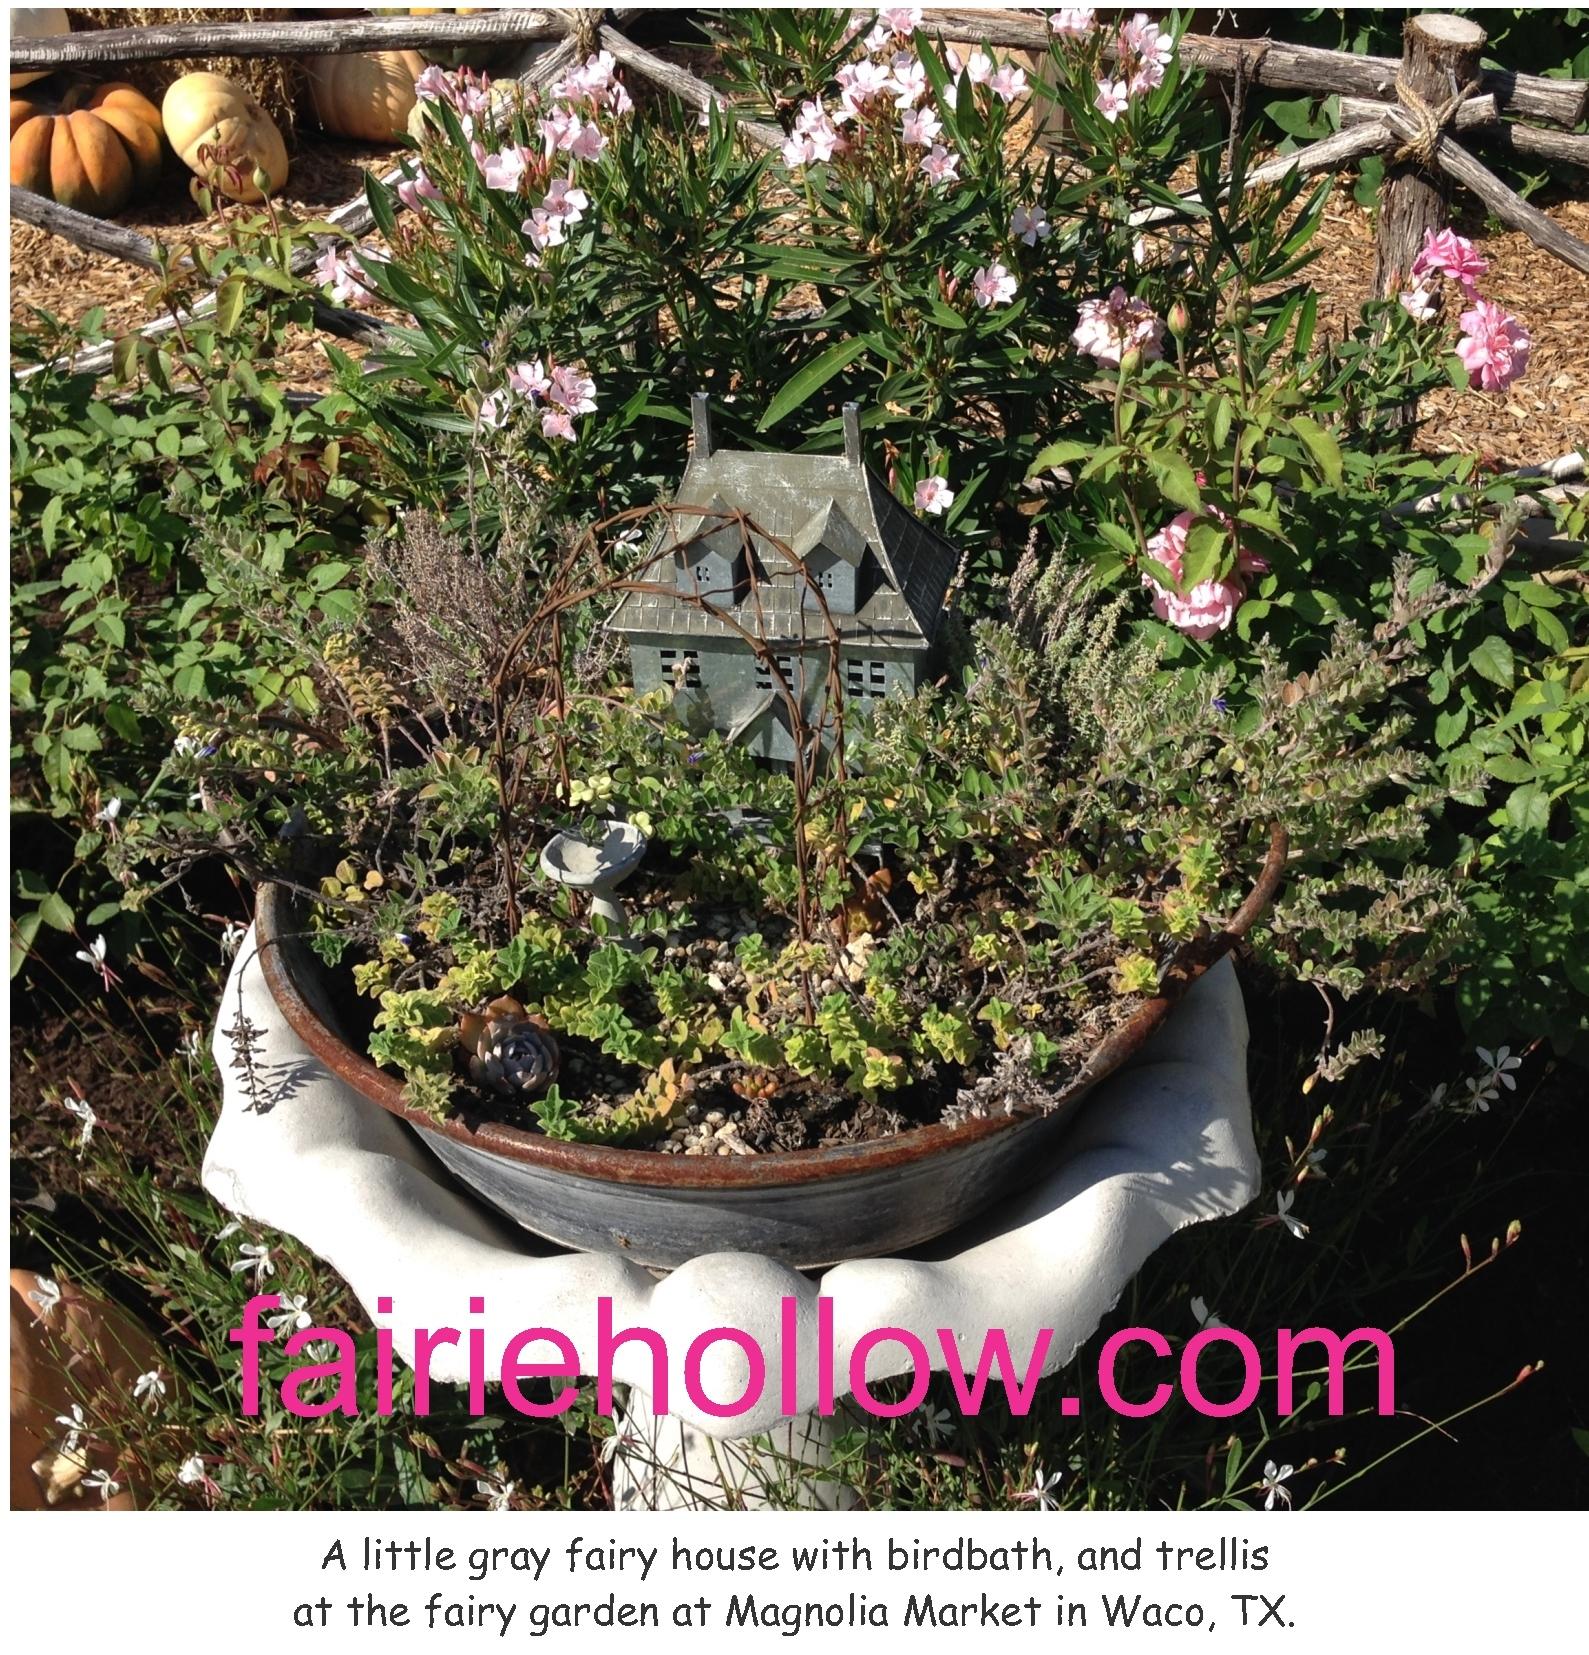 magnolia-market-little-gray-house-with-trellis-and-birdbath-2